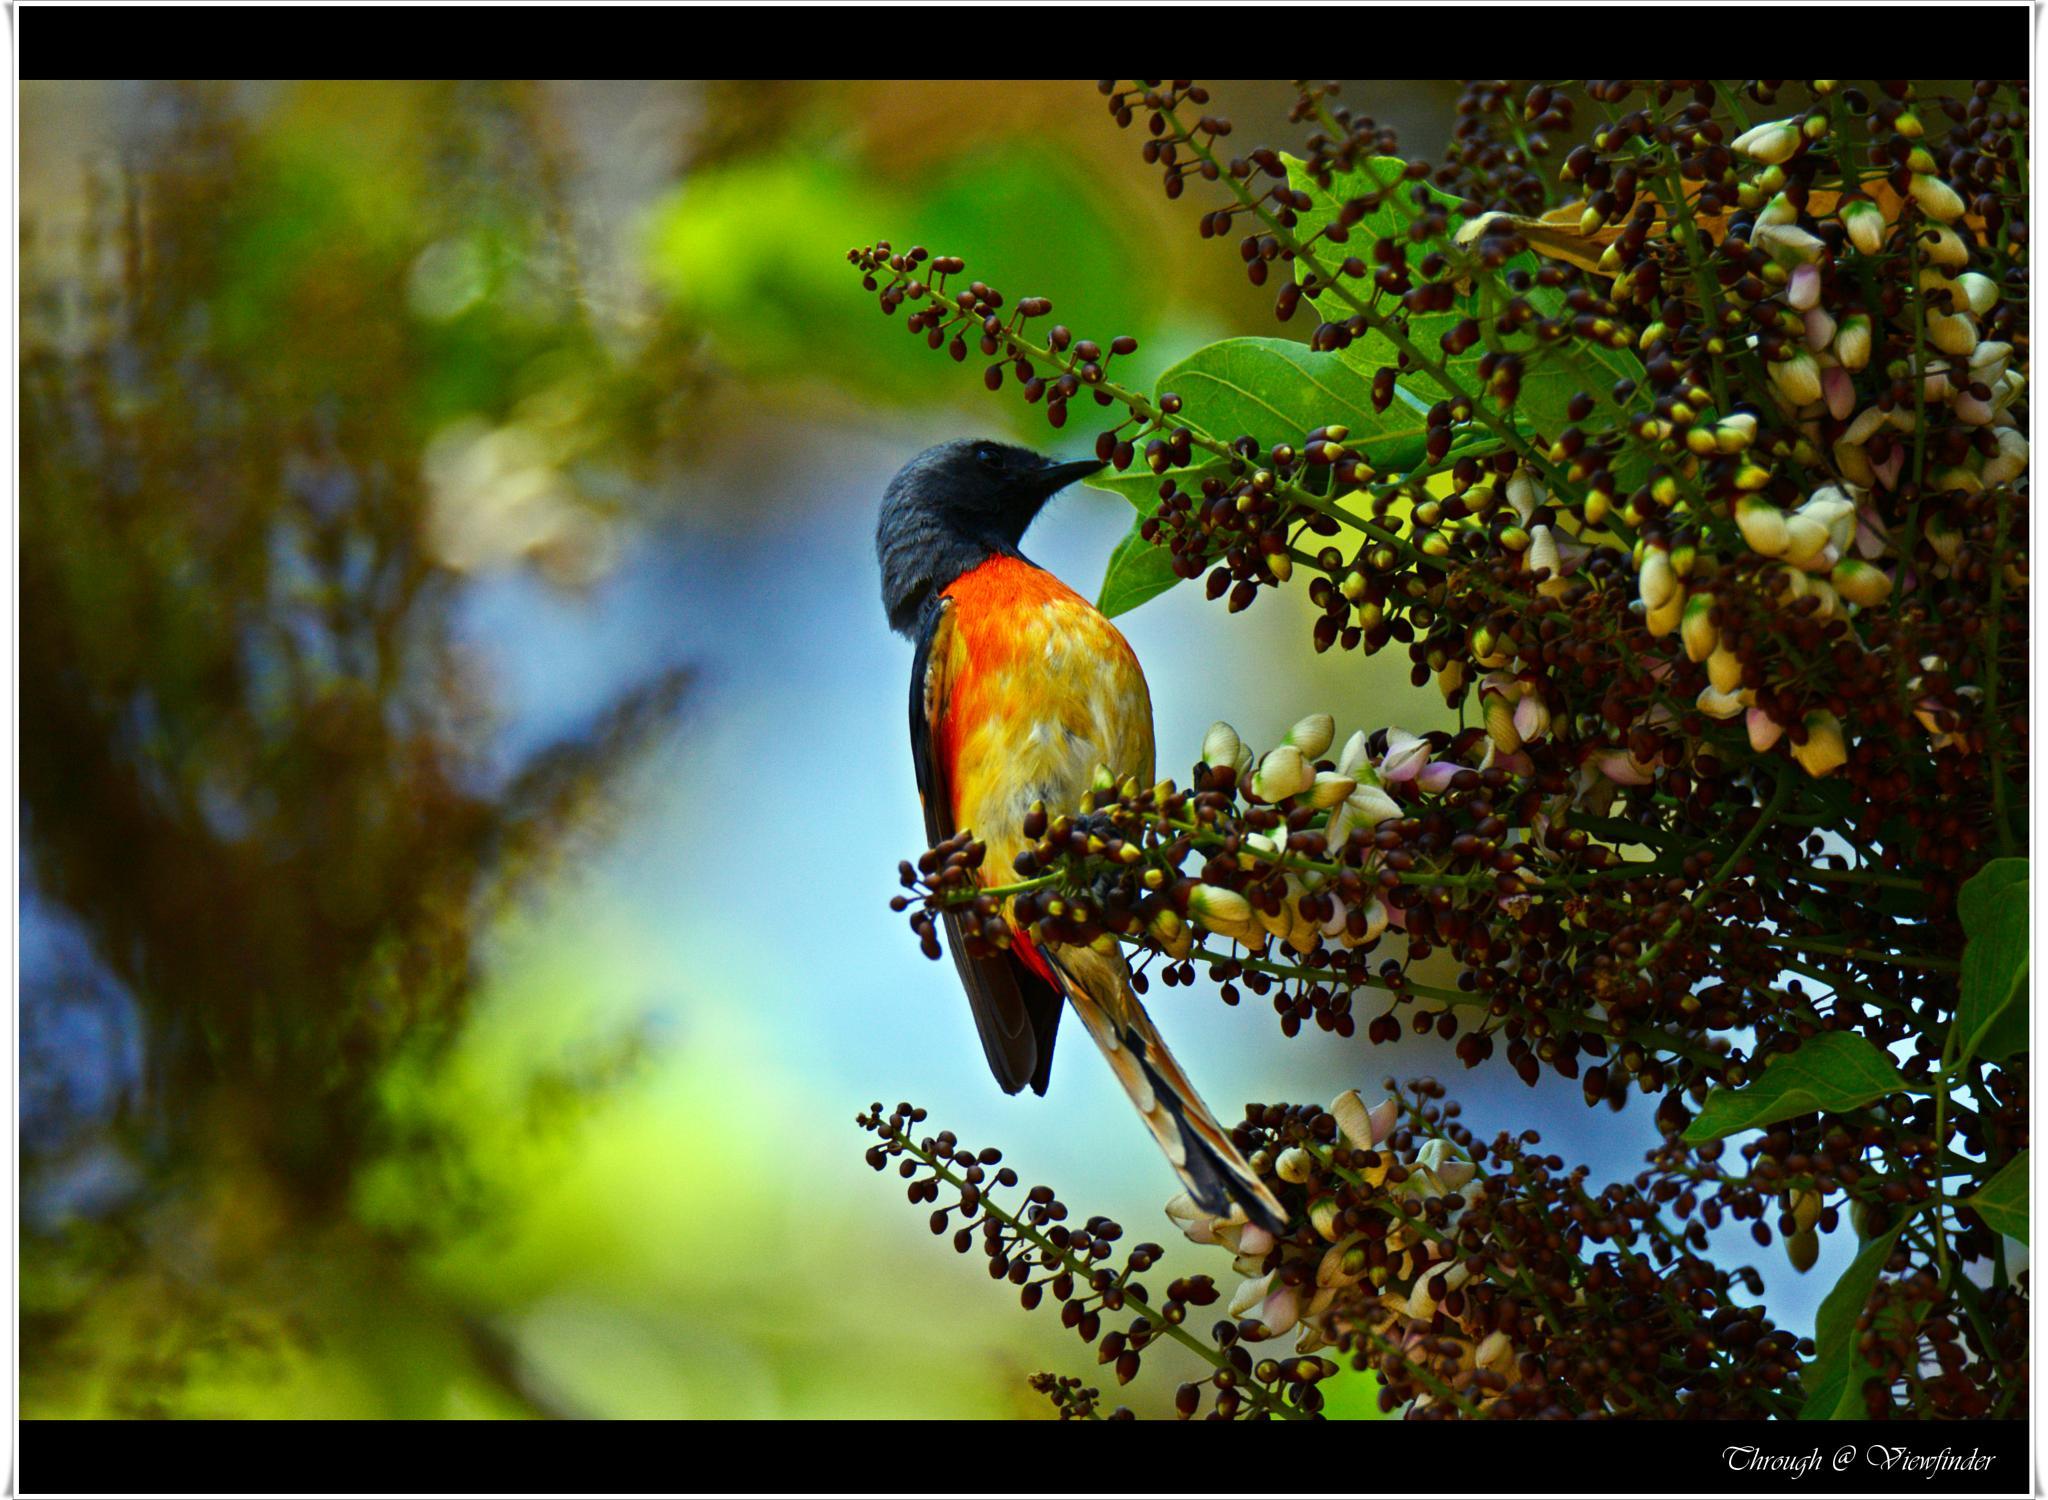 Scarlet Minivet by prashobh.ailyam